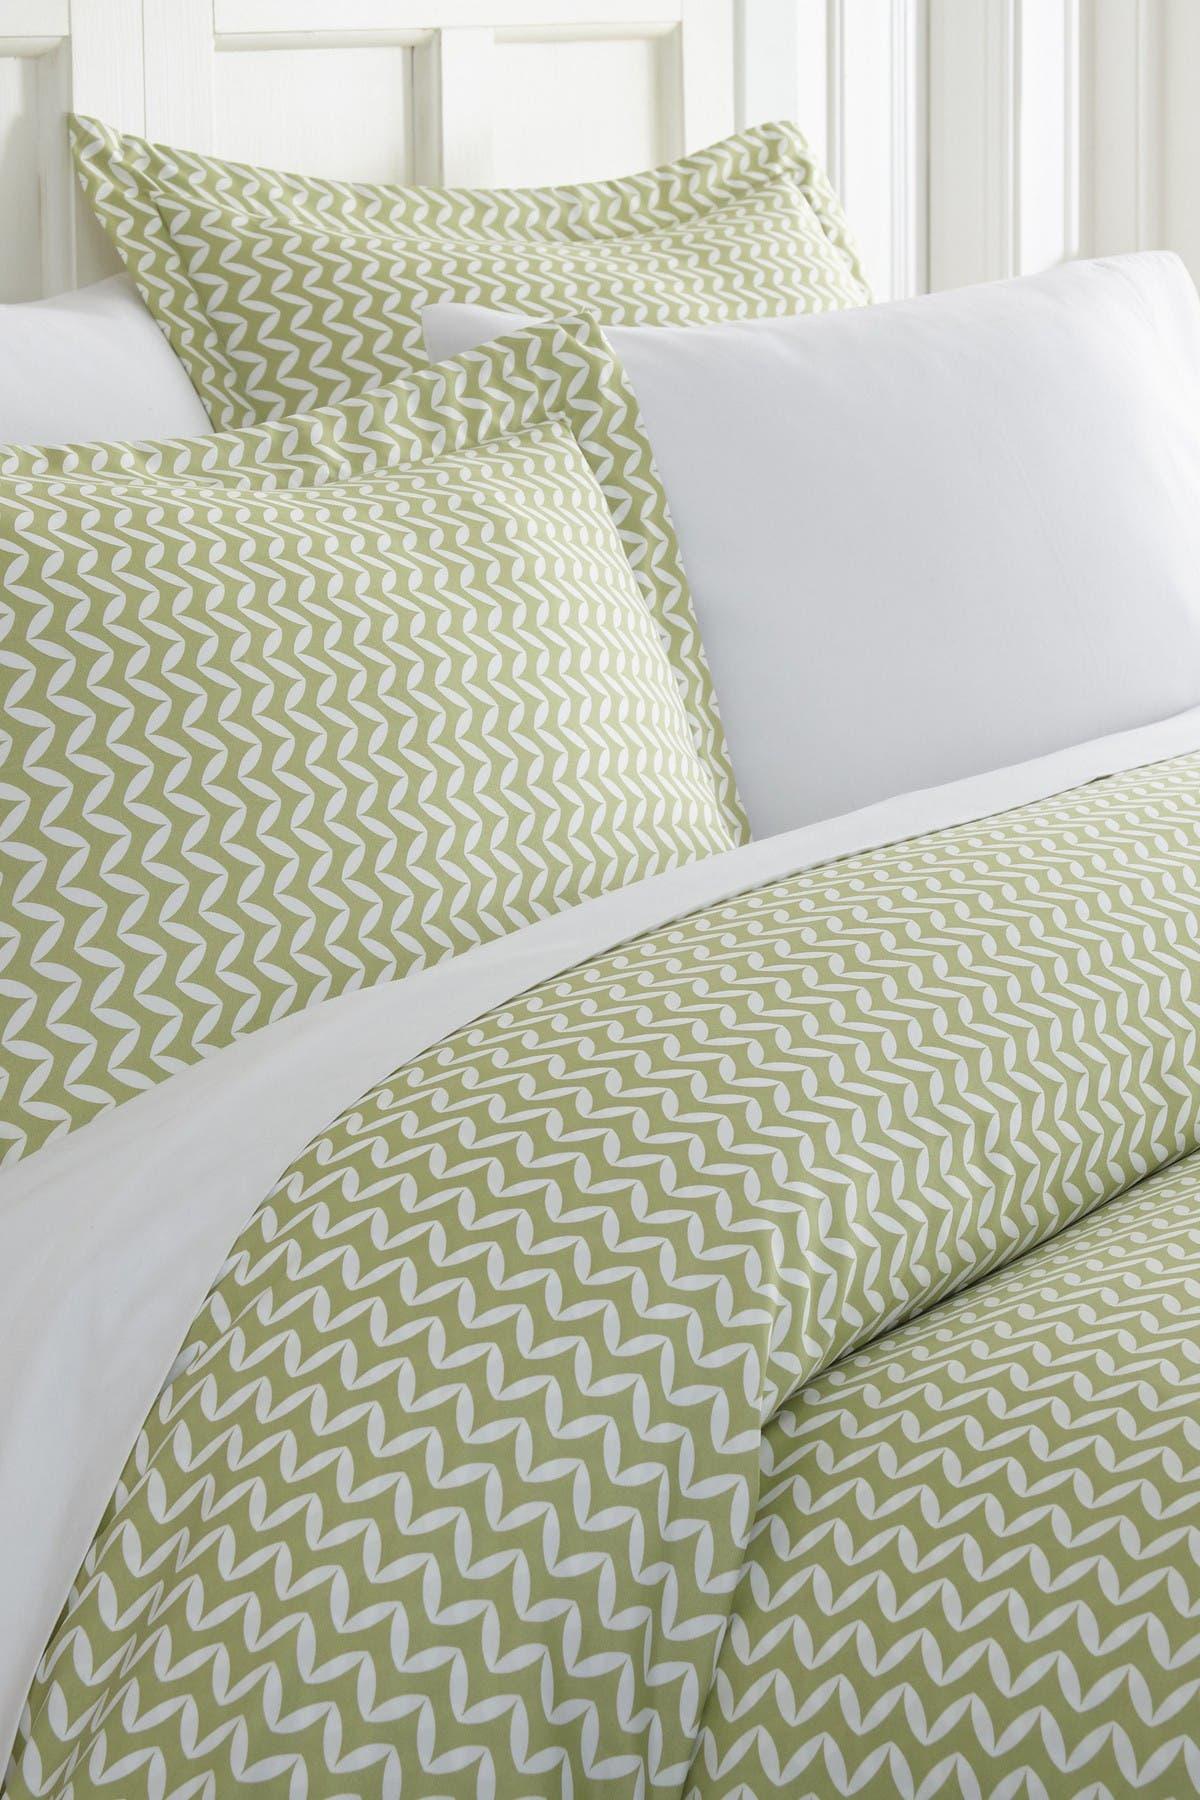 Image of IENJOY HOME Home Spun Premium Ultra Soft 3-Piece Puffed Chevron Print Duvet Cover King Set - Sage